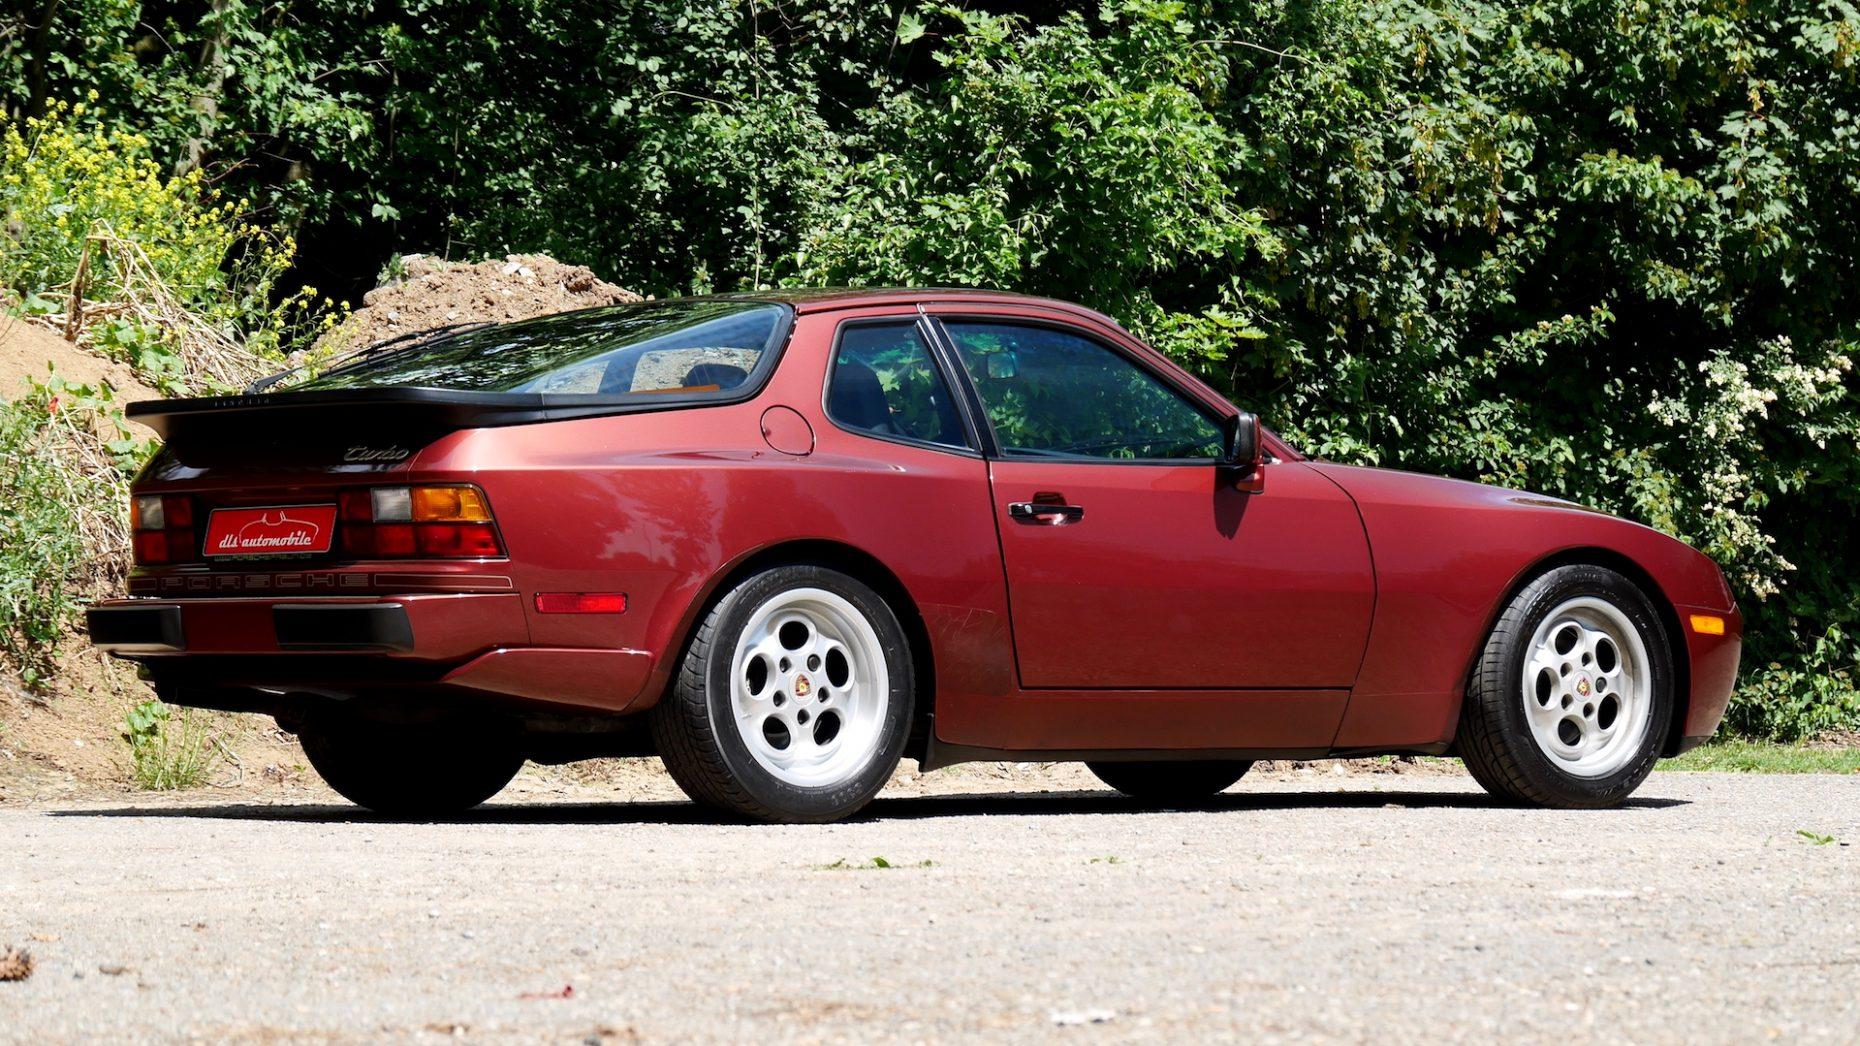 Porsche 944 Turbo Coupe 1986 Elferspot Com Marketplace For Porsche Sports Cars